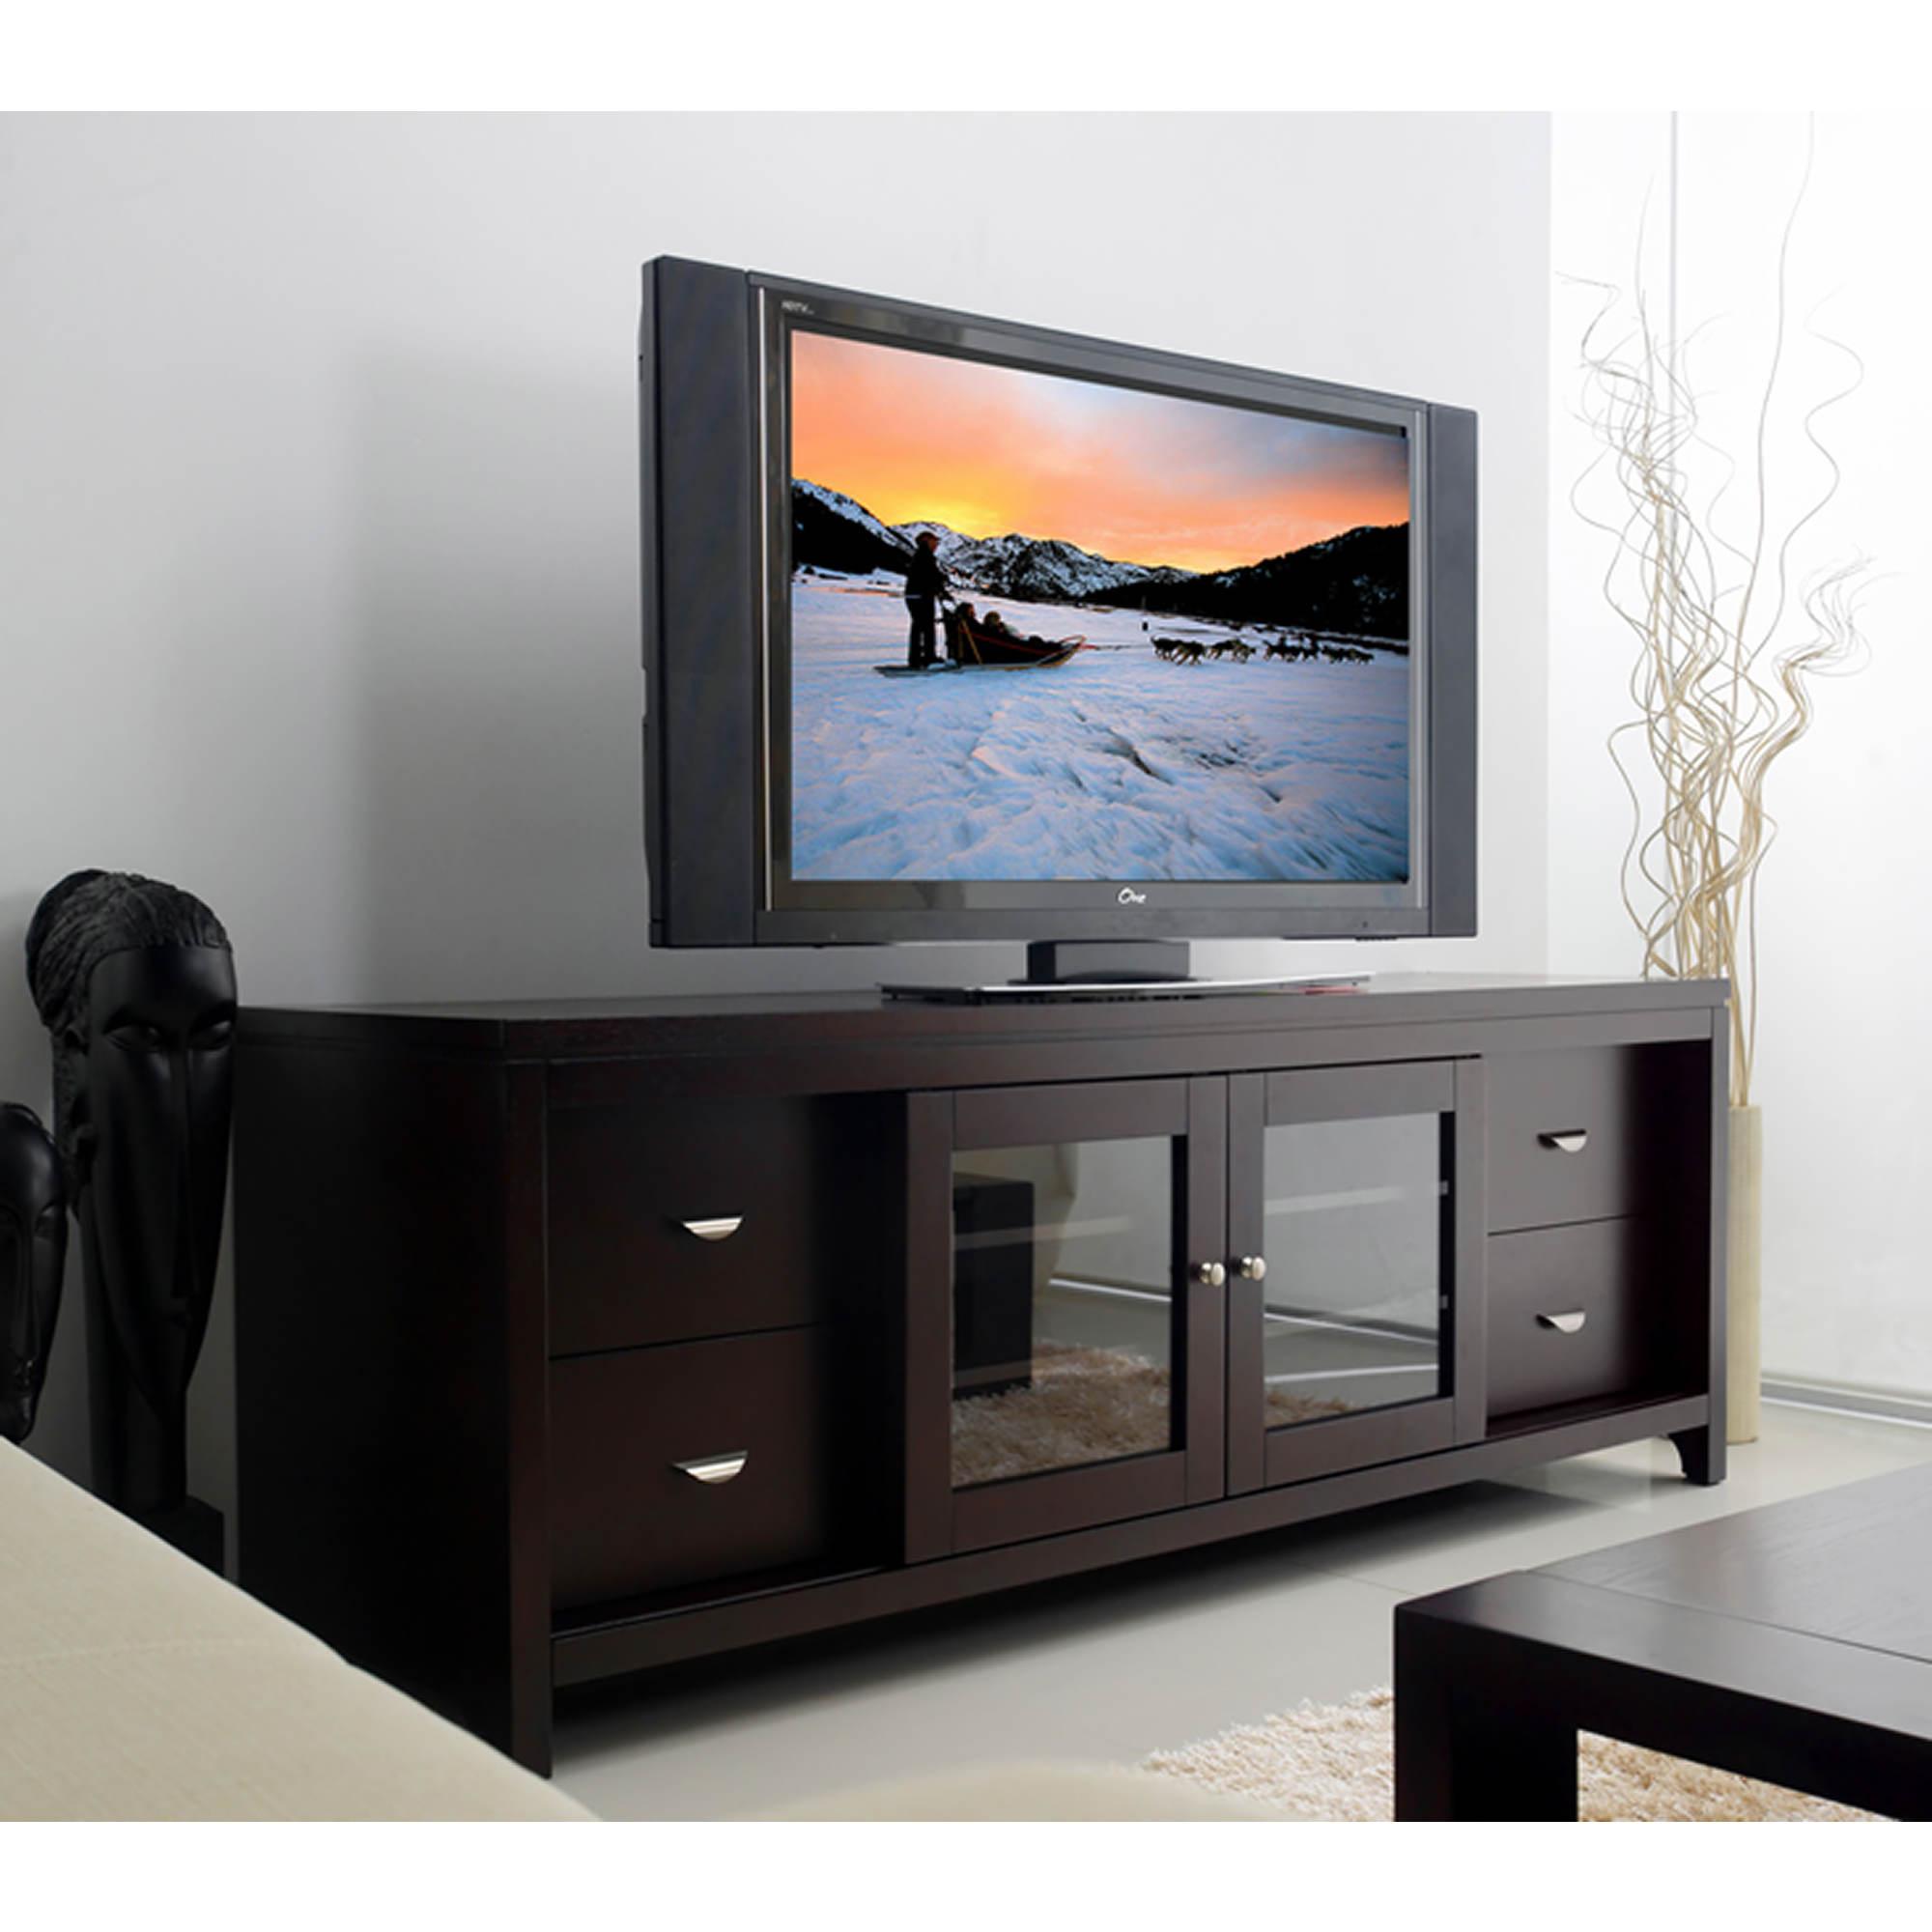 Cheap legends furniture cambridge fireplace media center in cherry - Abbyson Living Montego 72 Entertainment Center Espresso